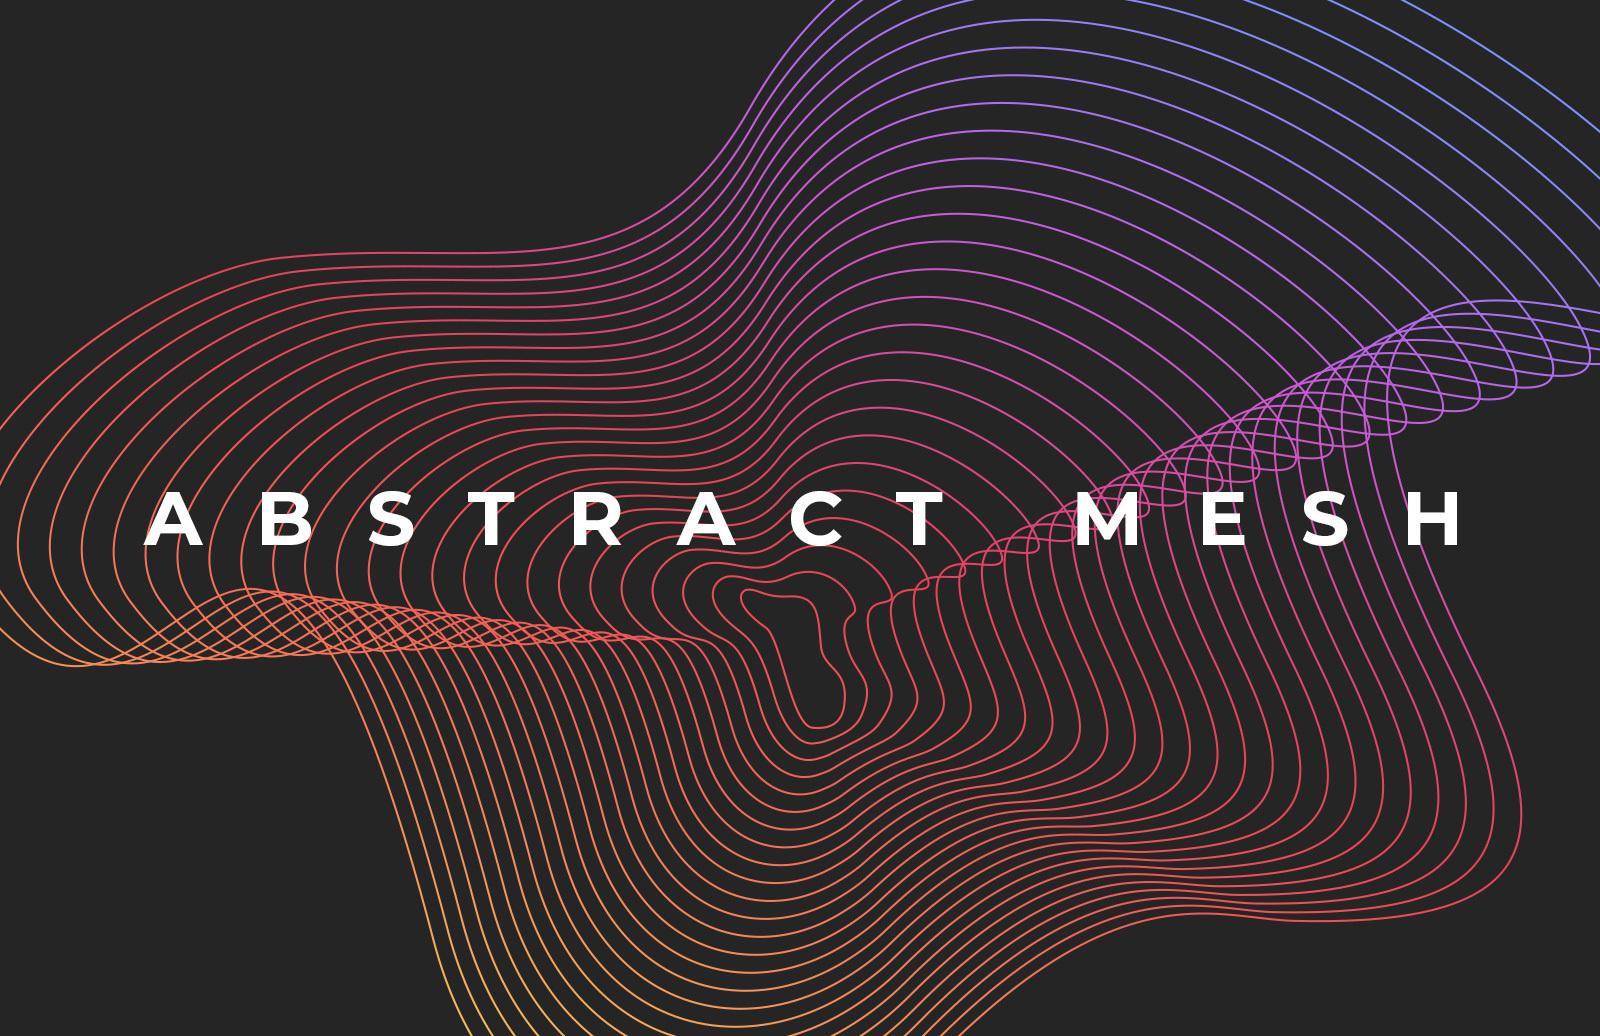 Abstract Mesh Vectors